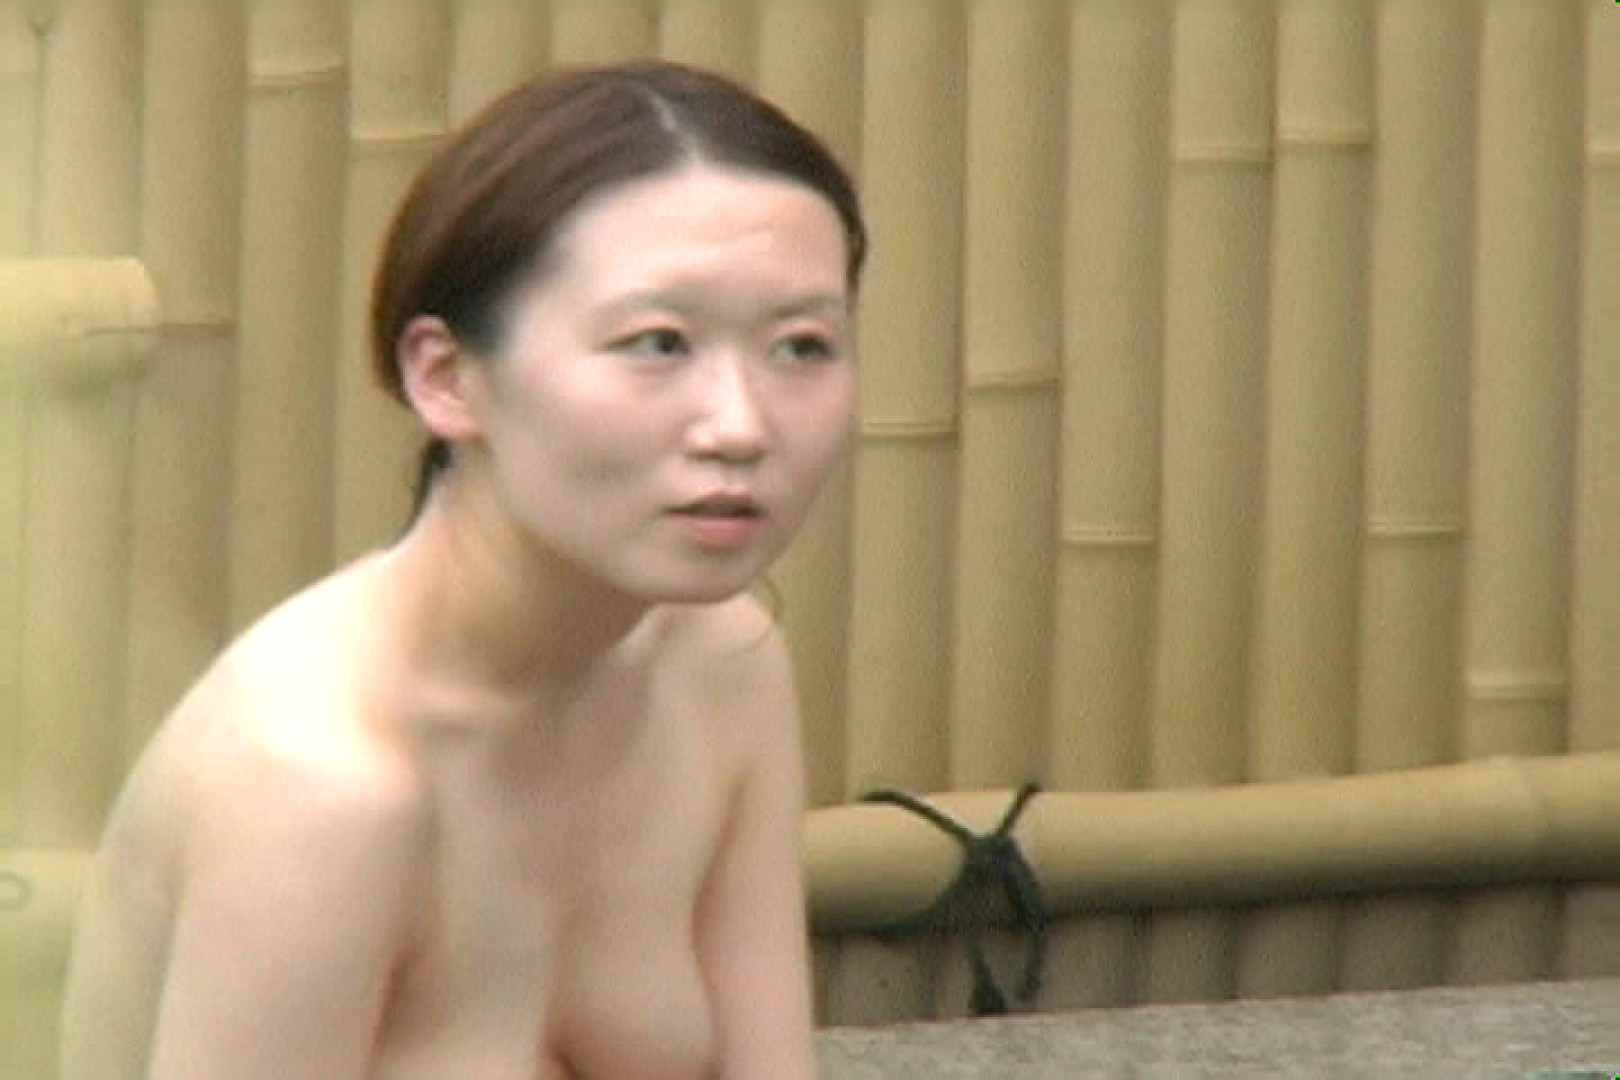 Aquaな露天風呂Vol.10【VIP】 露天風呂突入 われめAV動画紹介 93pic 38